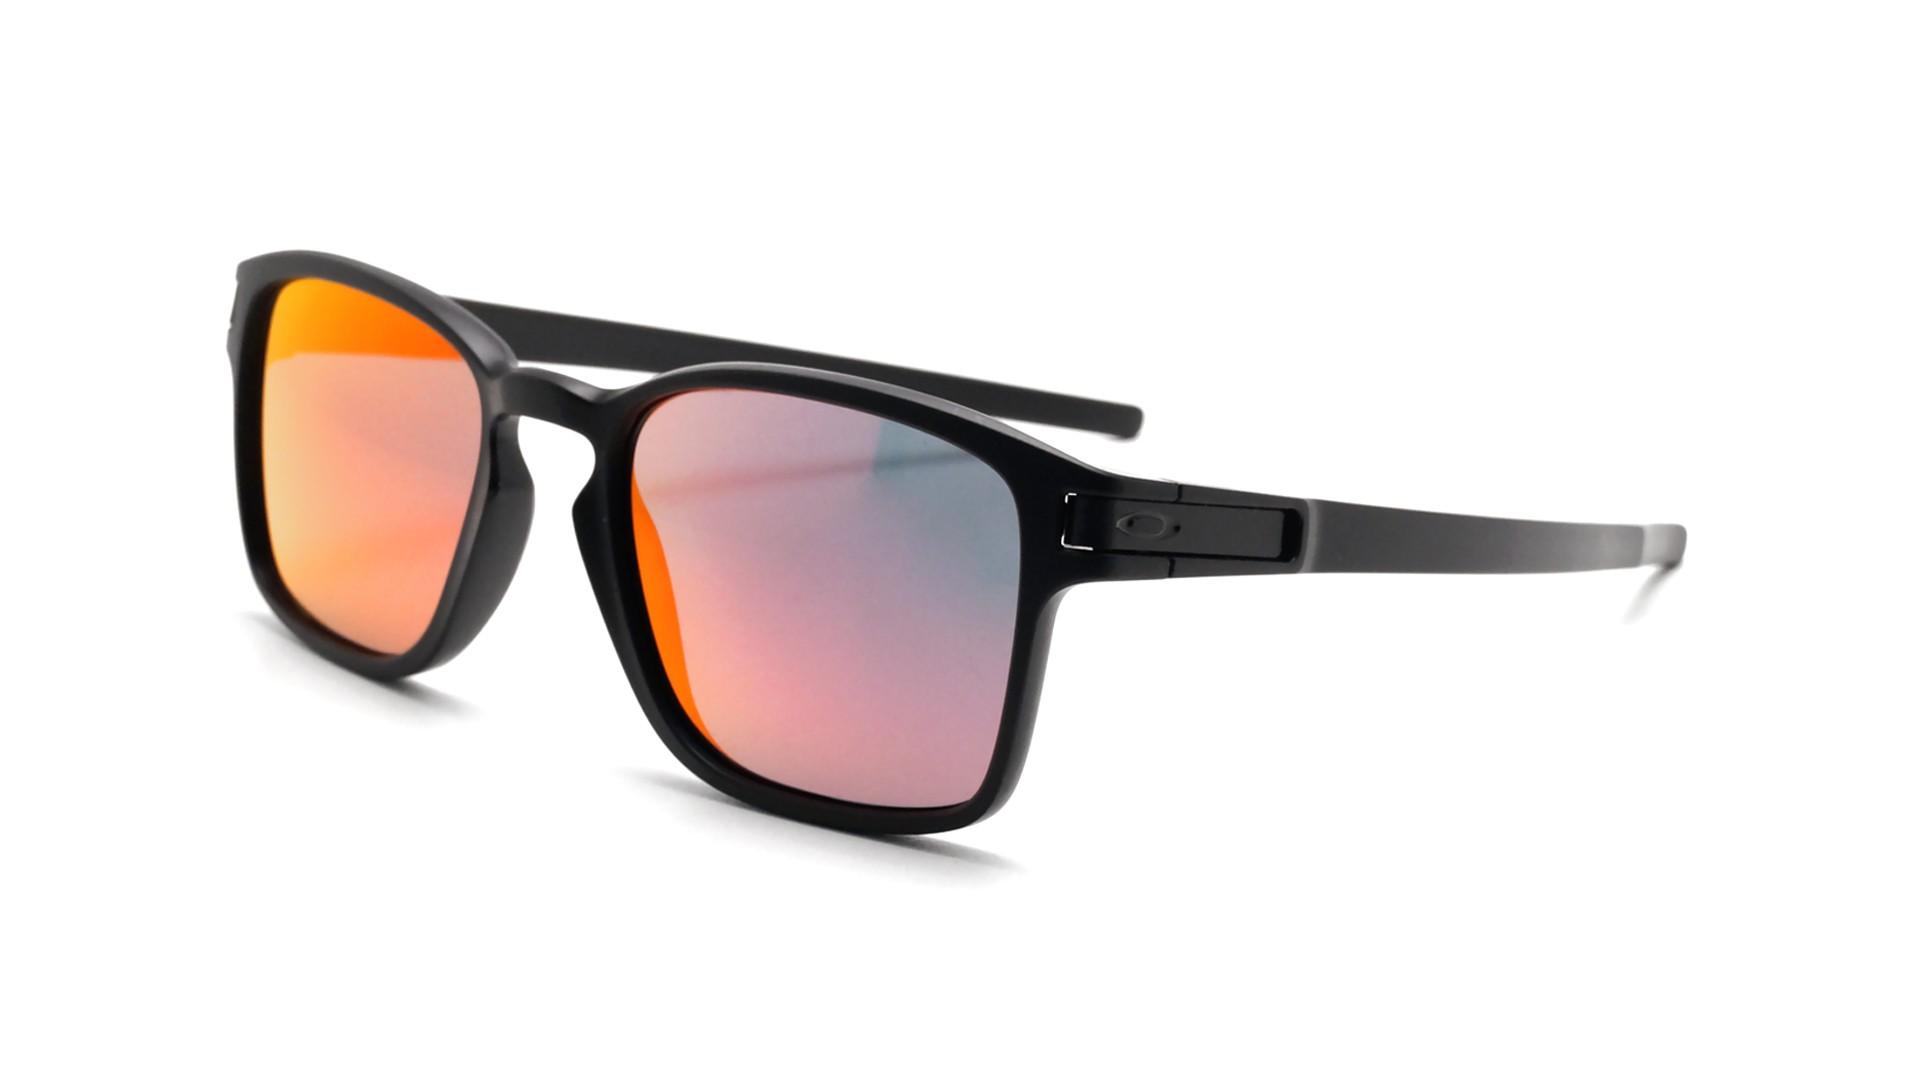 1178c1004e Sunglasses Oakley Latch Sq Black OO9353 03 52-19 Medium Flash